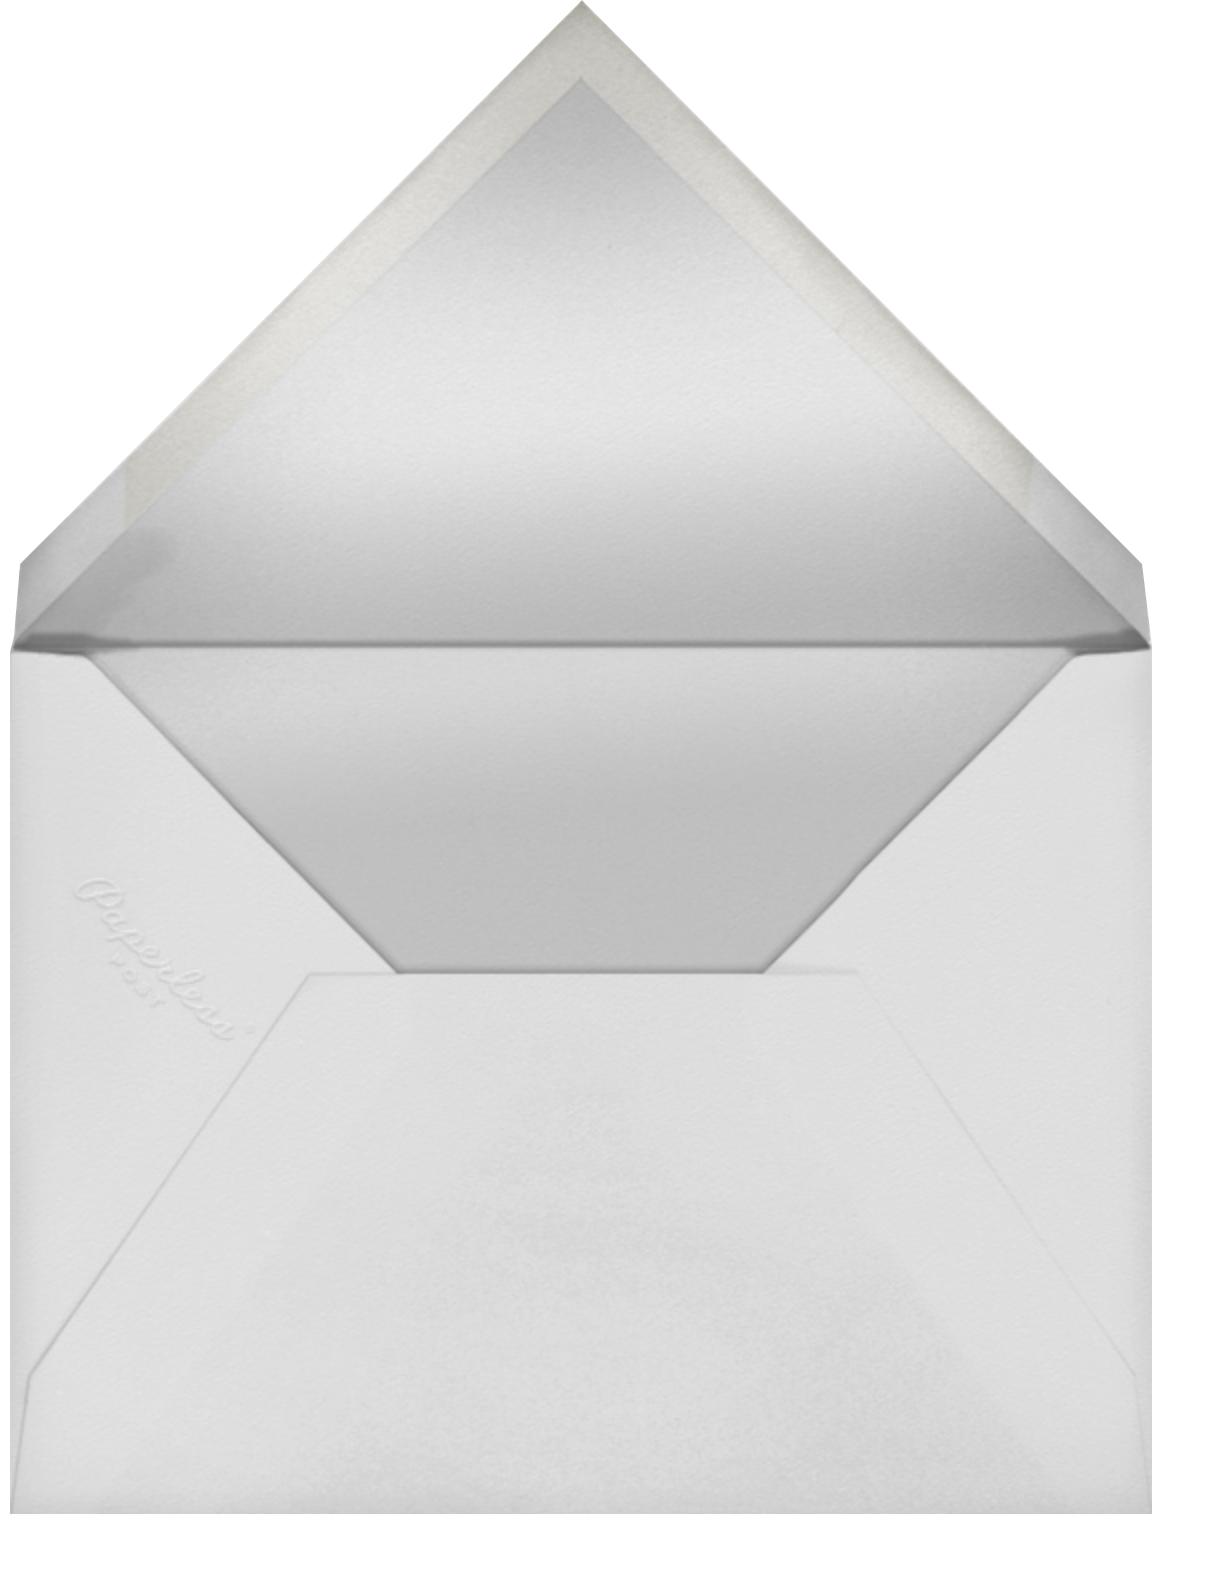 Melbourne  Skyline View (Menu) - Black/White - Paperless Post - Menus - envelope back